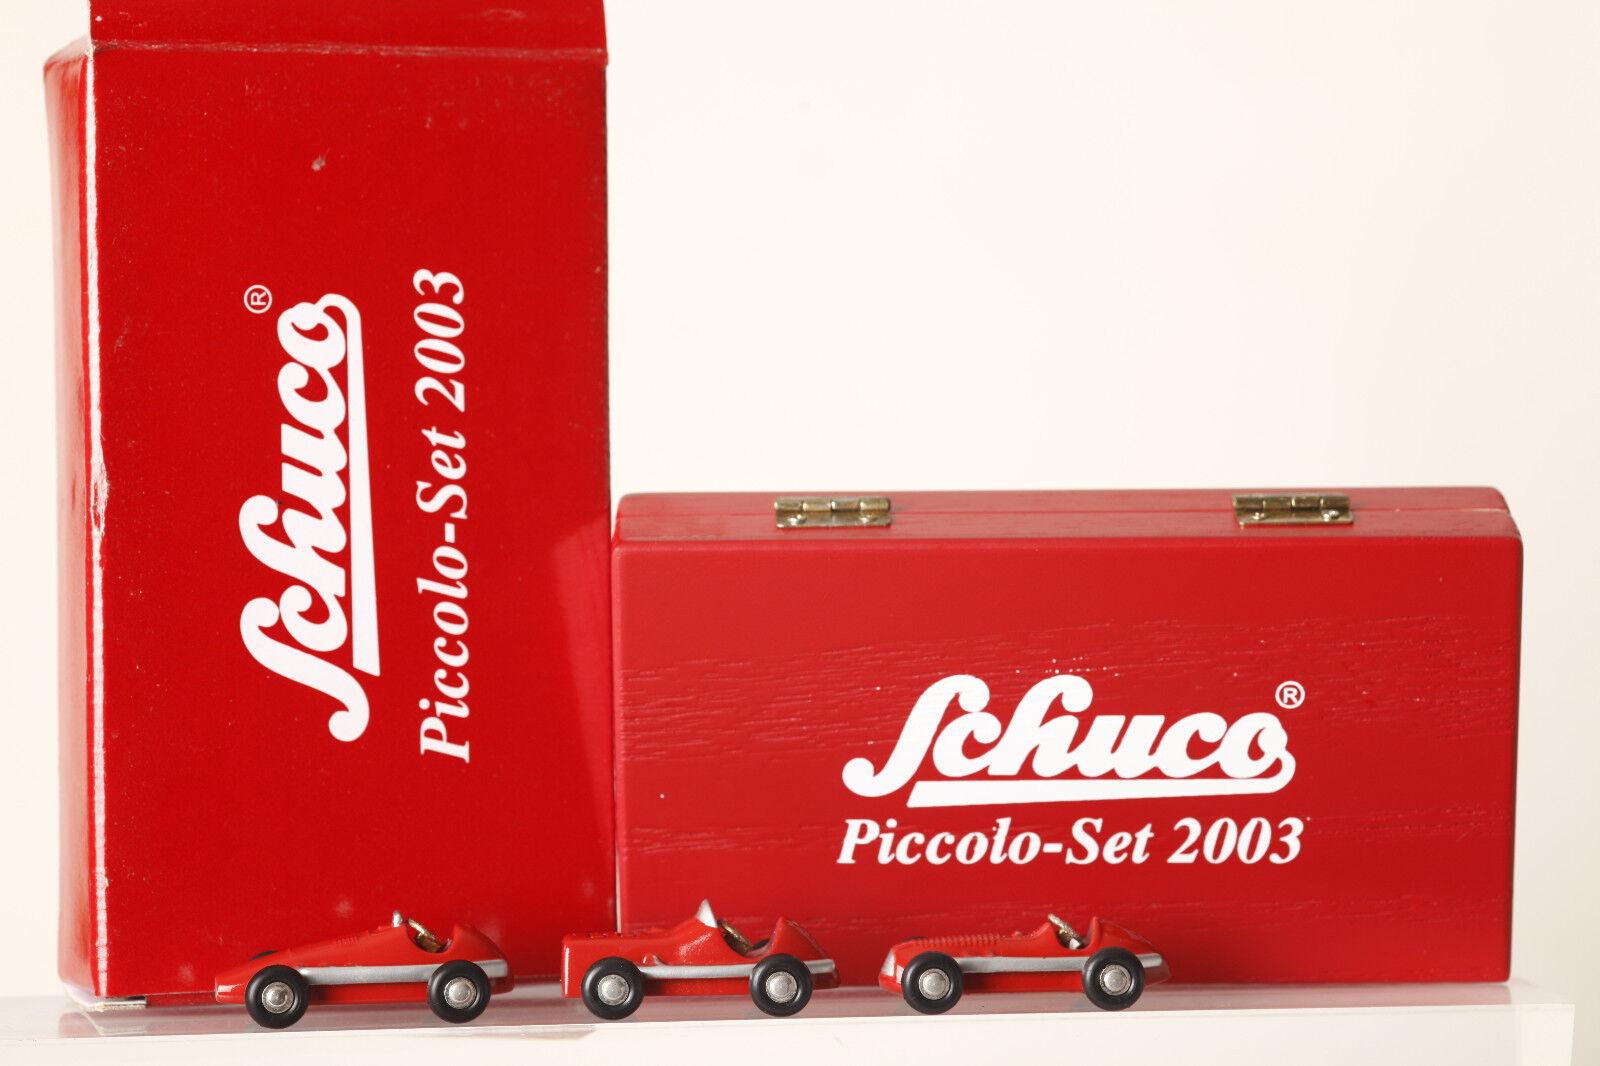 Schuco Piccolo 3er-set 2003 Gr Prix Racer Midget Maserati All Red (65064)